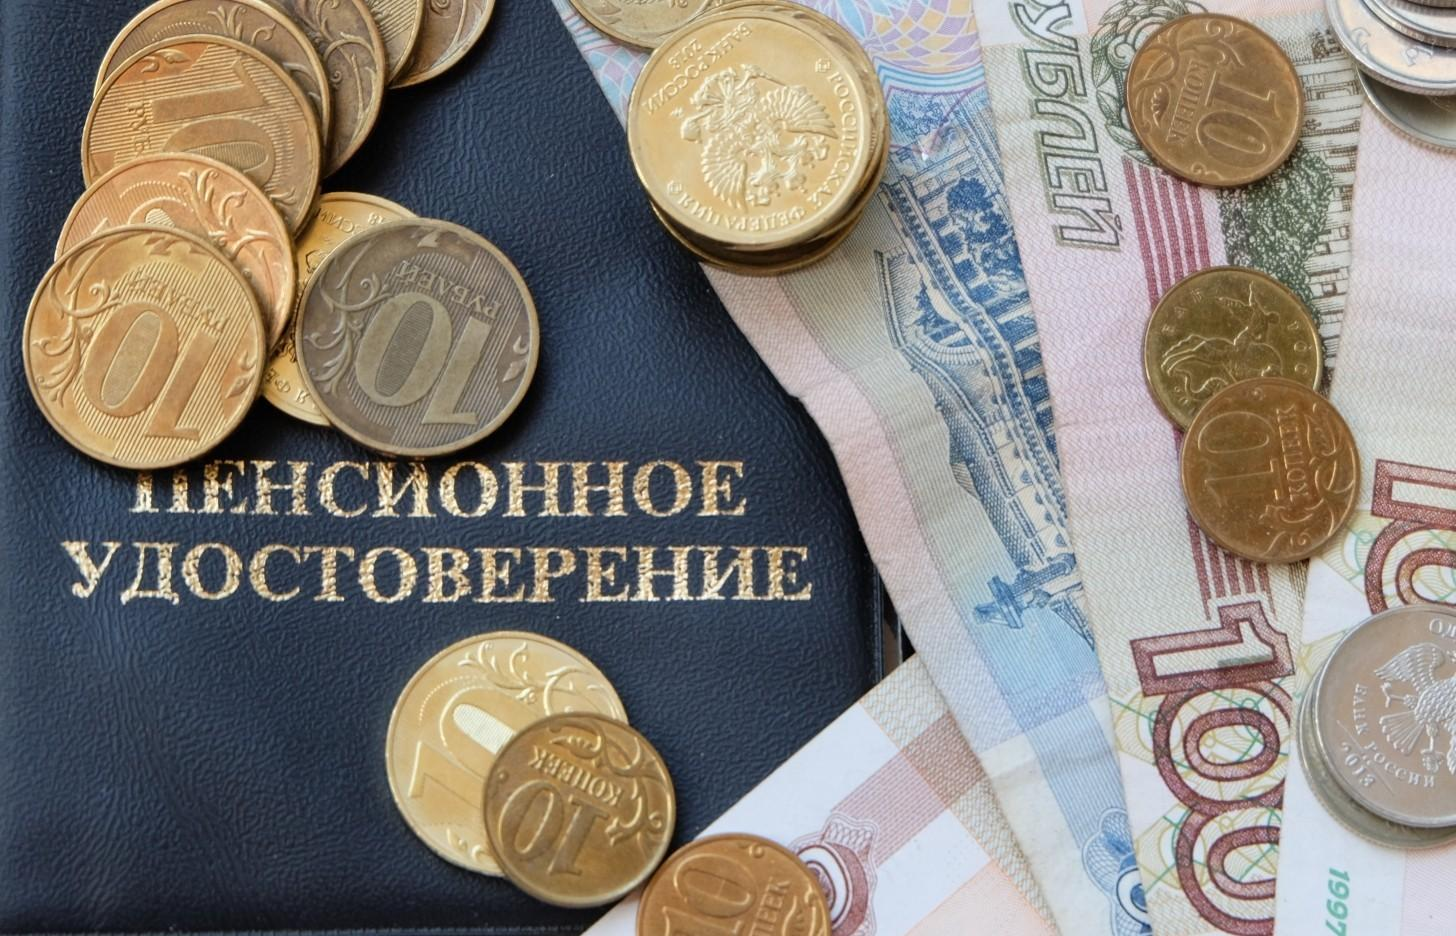 Пенсии россиян избавили от посредников  - новости Афанасий